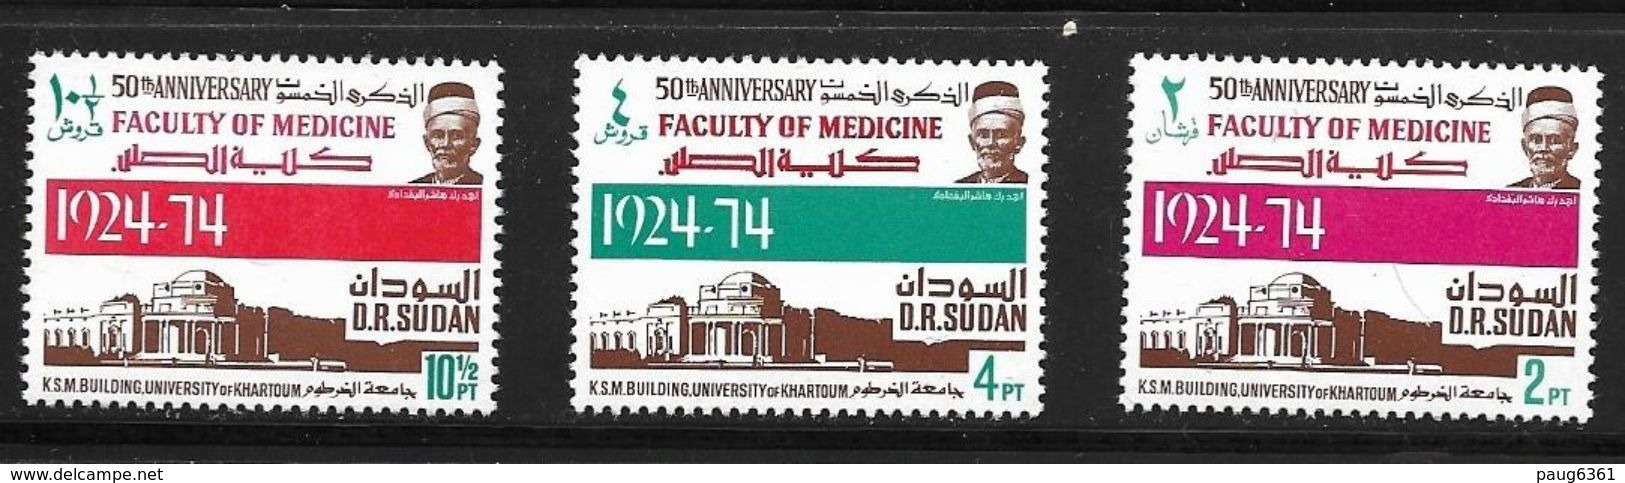 SOUDAN 1974 FACULTE DE MEDECINE   YVERT N°272/74  NEUF MNH** - Soudan (1954-...)